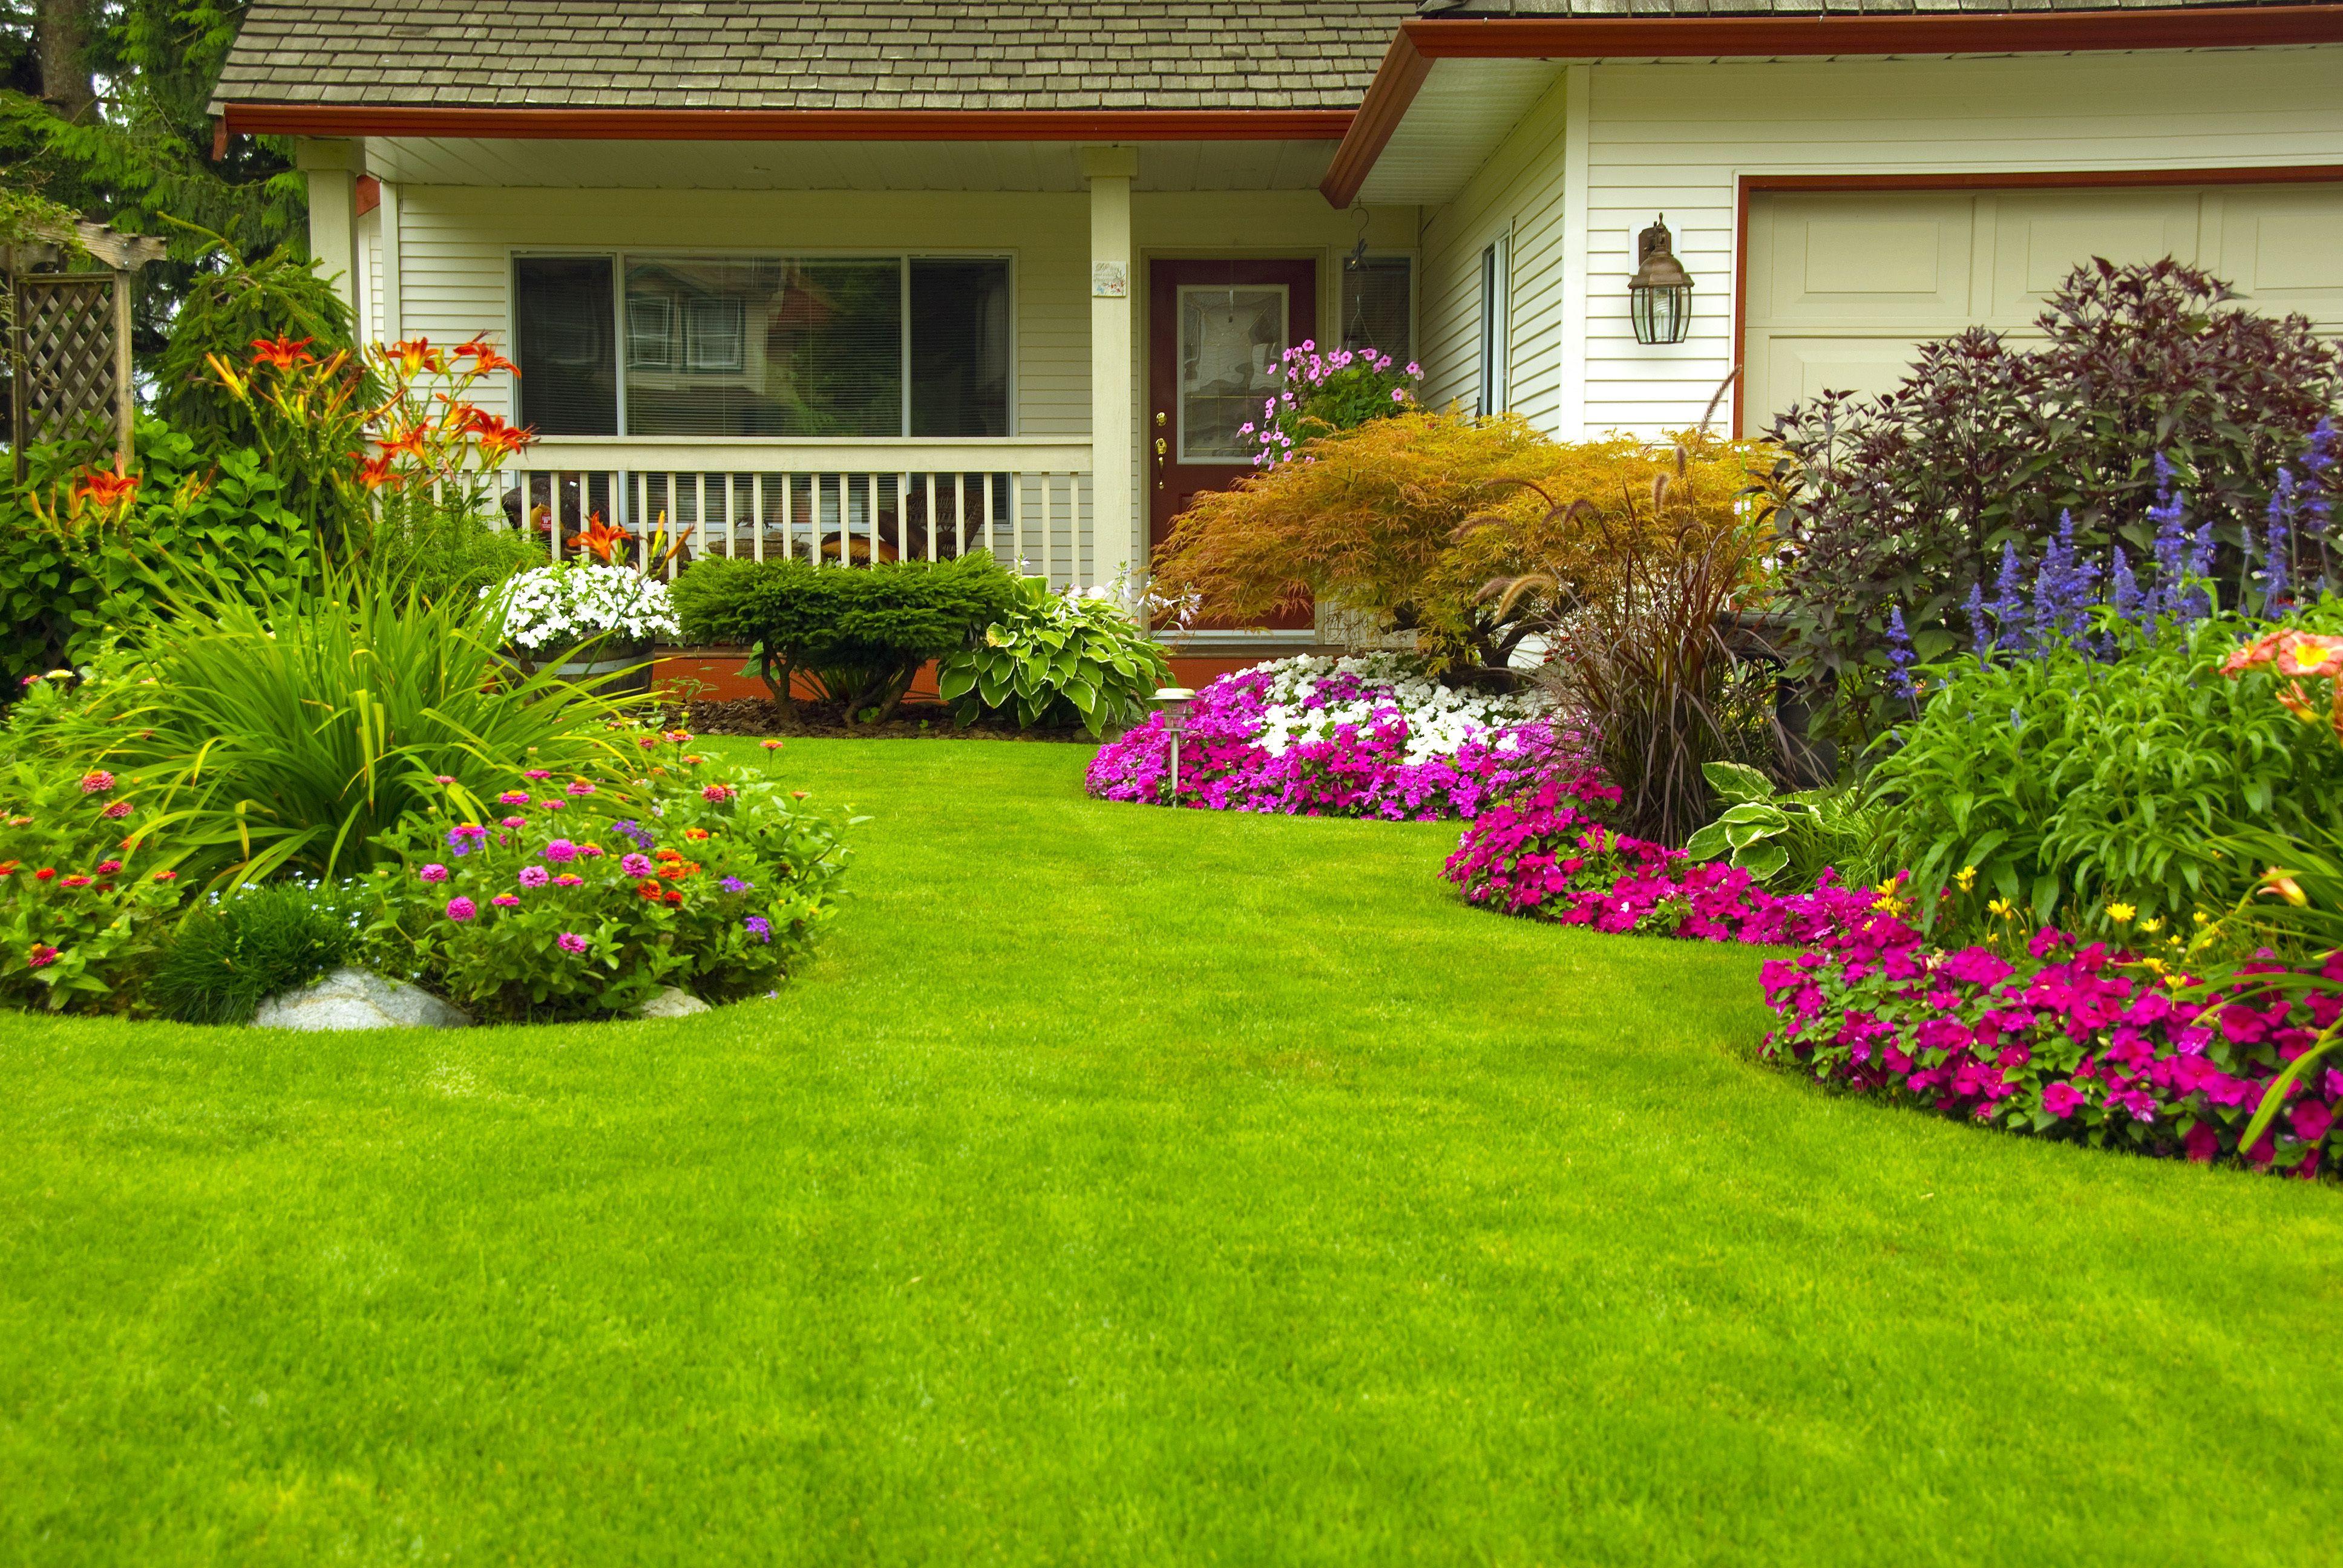 Garden Landscape Images nikaelcom